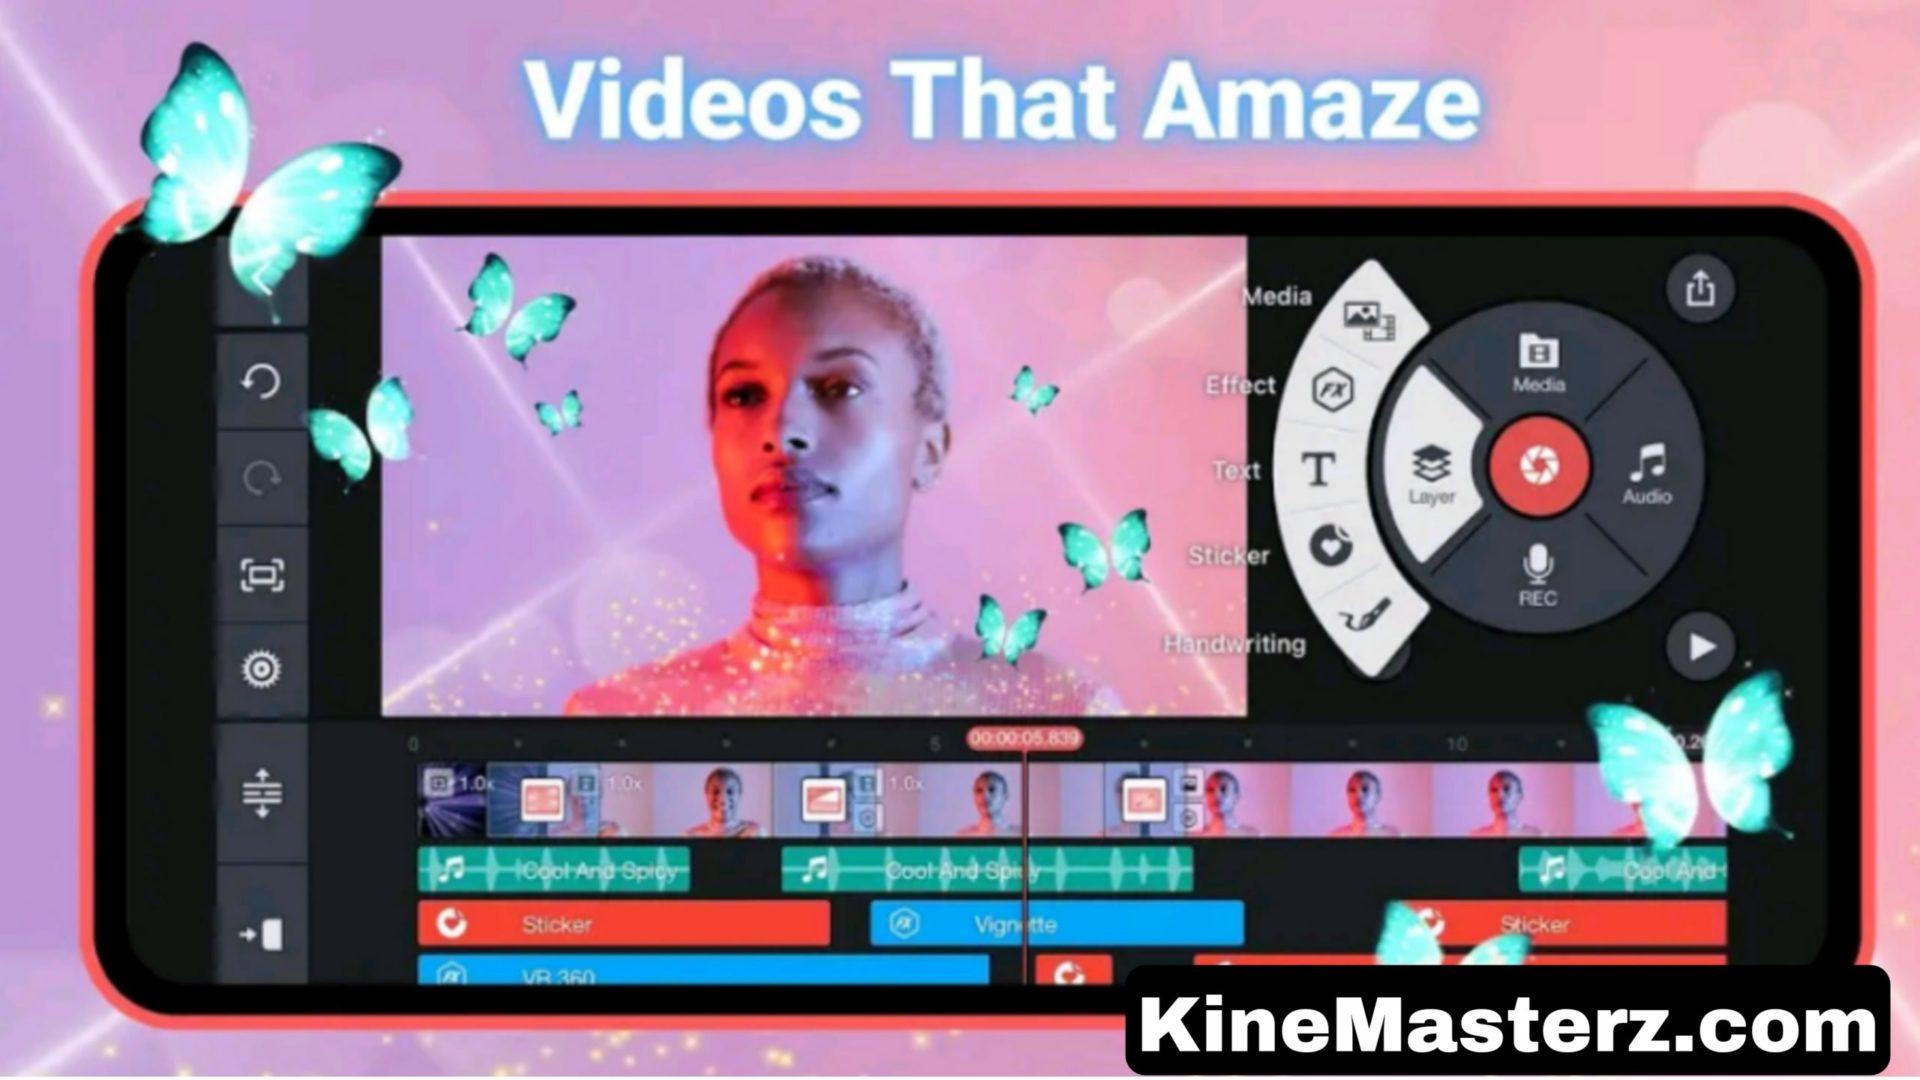 Kinemaster Pro Apk Download (No Watermark) September 2021